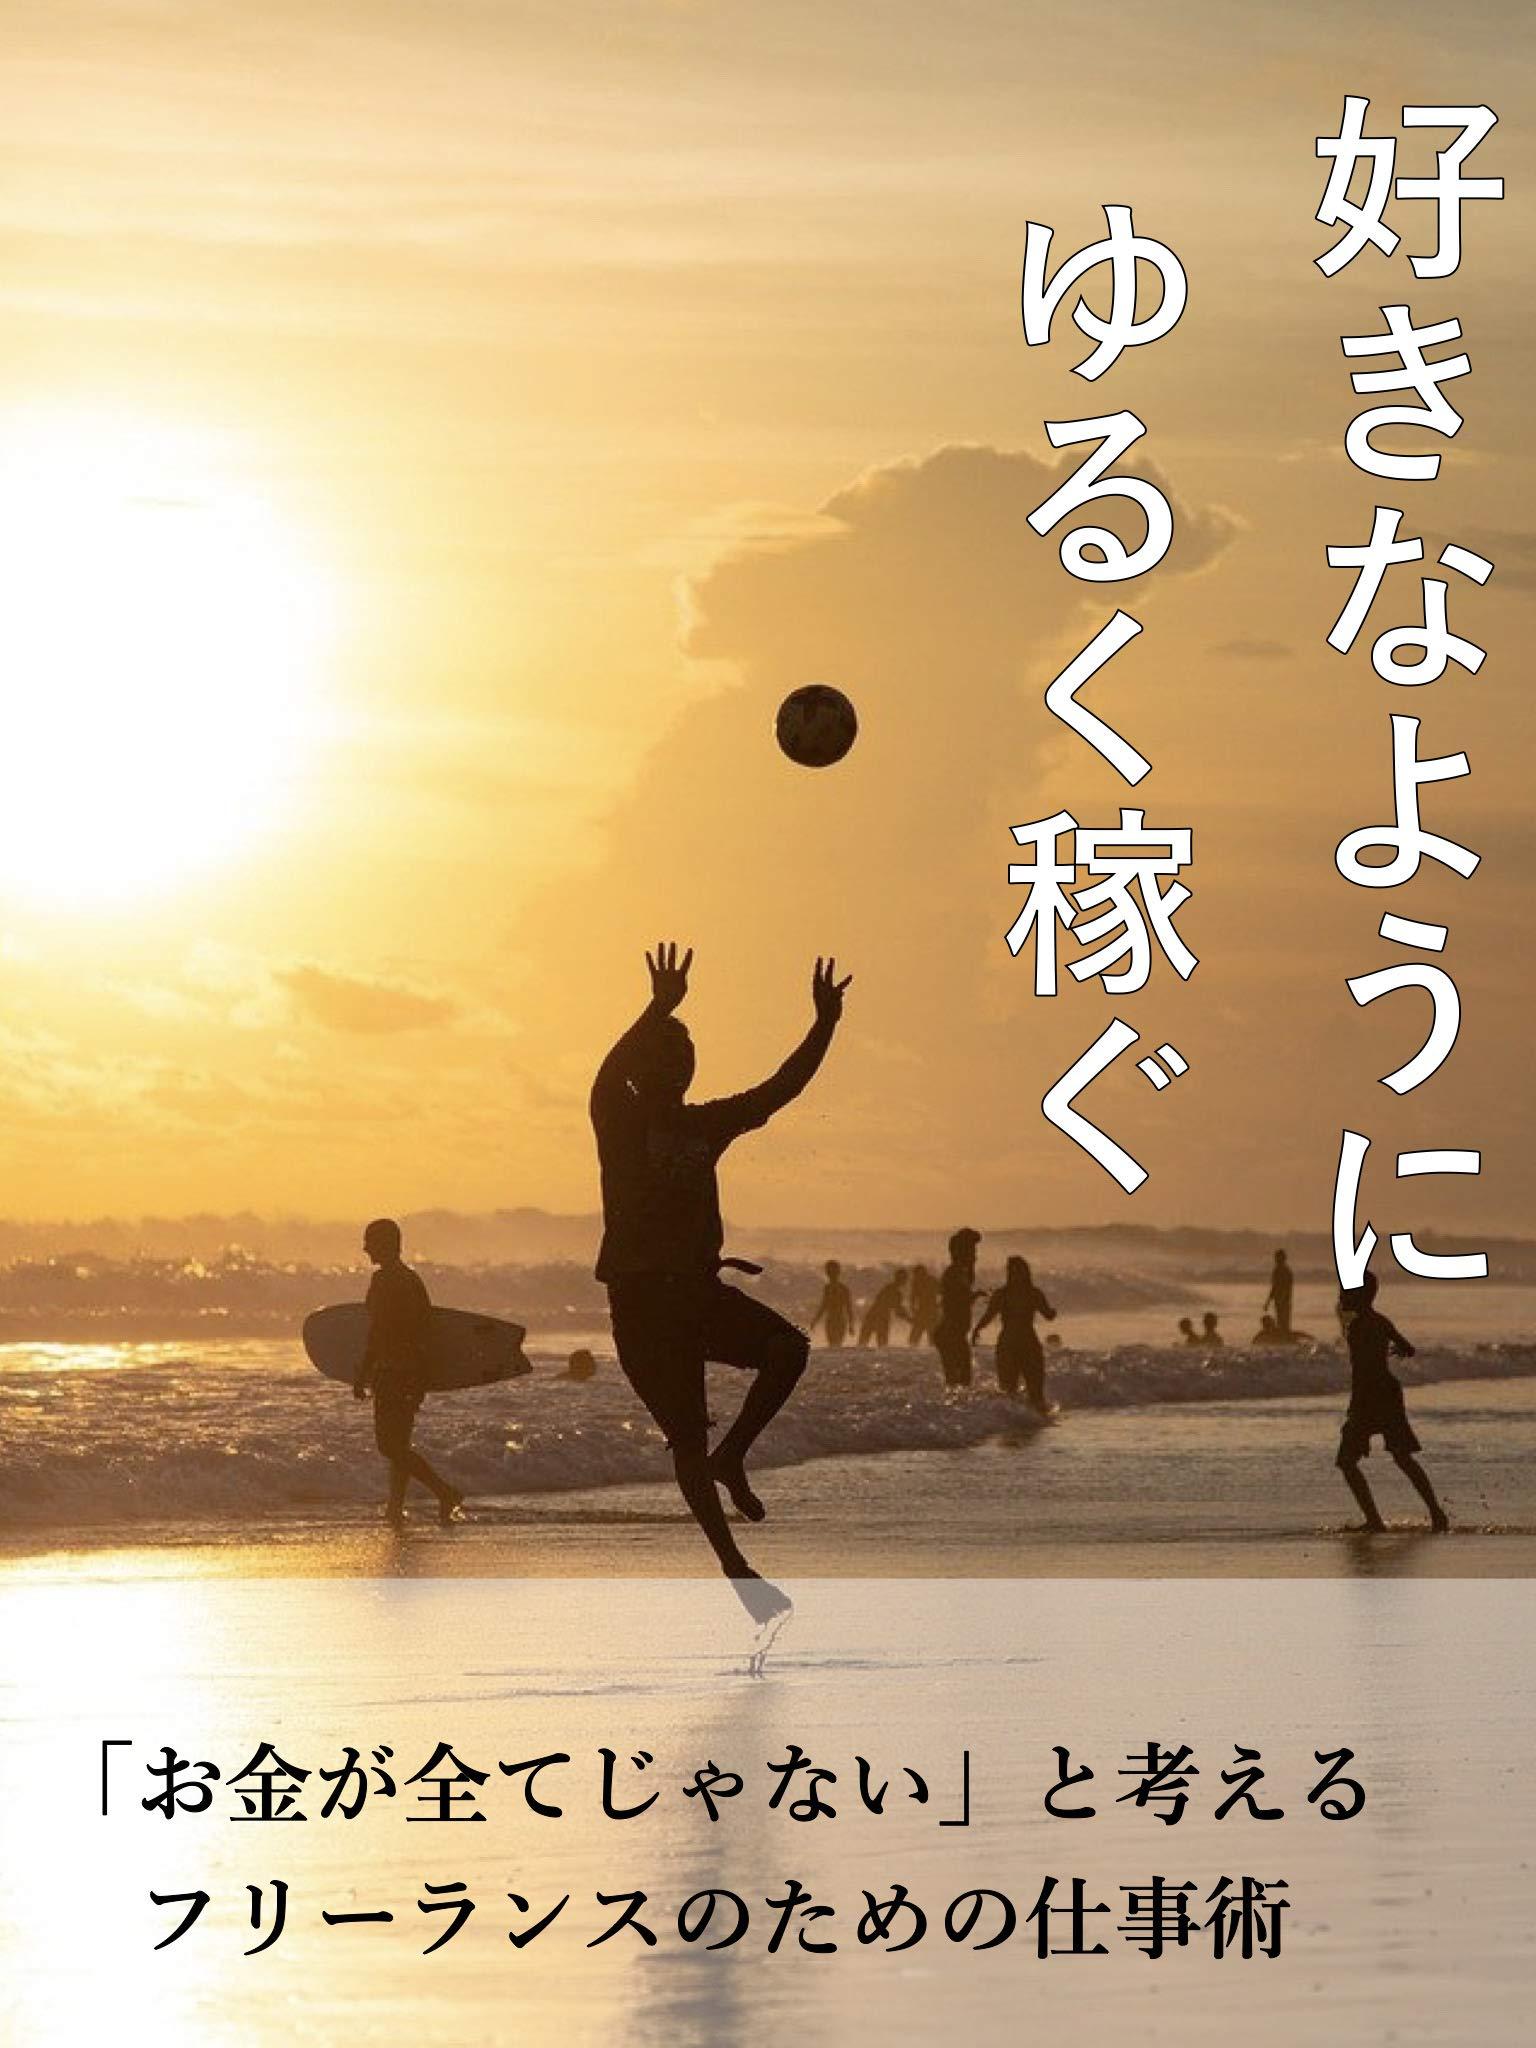 sukinayouniyurukukasegu: okaneyasigotogasubetejyanaitokanngaerufreeransunotamenosigotojiyutu (zaitakufukugilyoukennkyuujyo) (Japanese Edition)